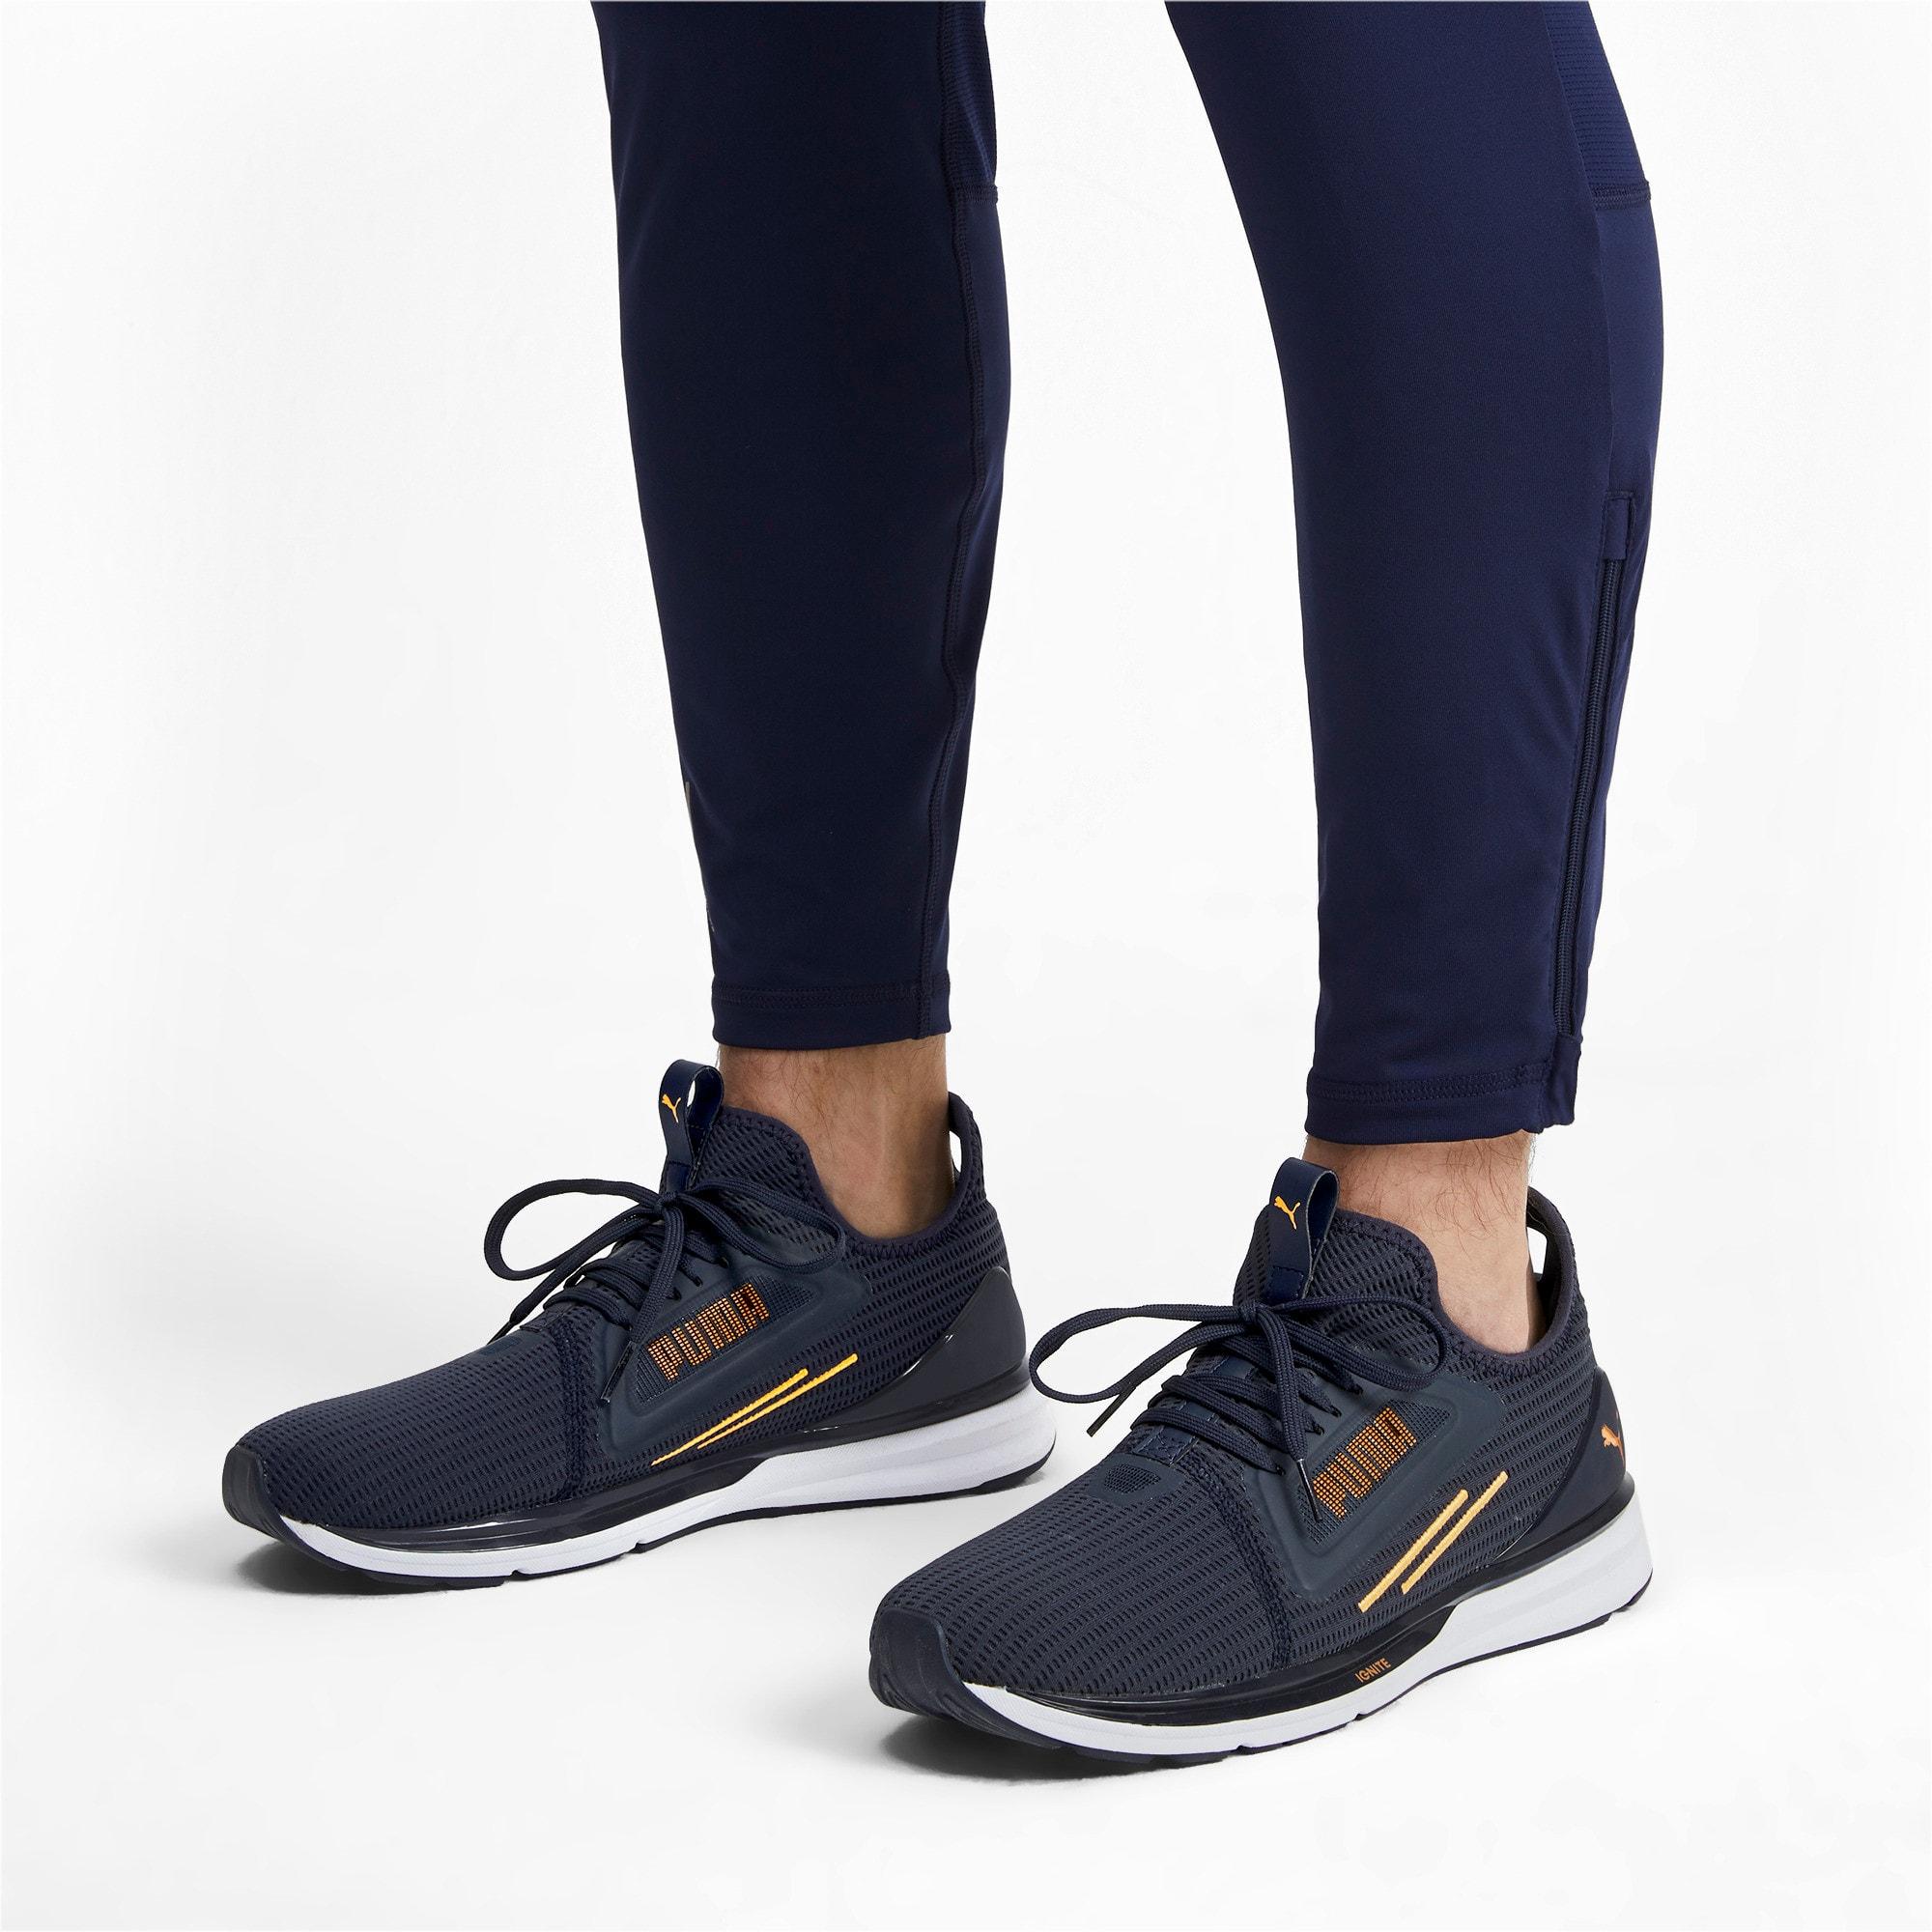 Thumbnail 3 of IGNITE Limitless Lean Running Shoes, Peacoat-Orange Alert, medium-IND